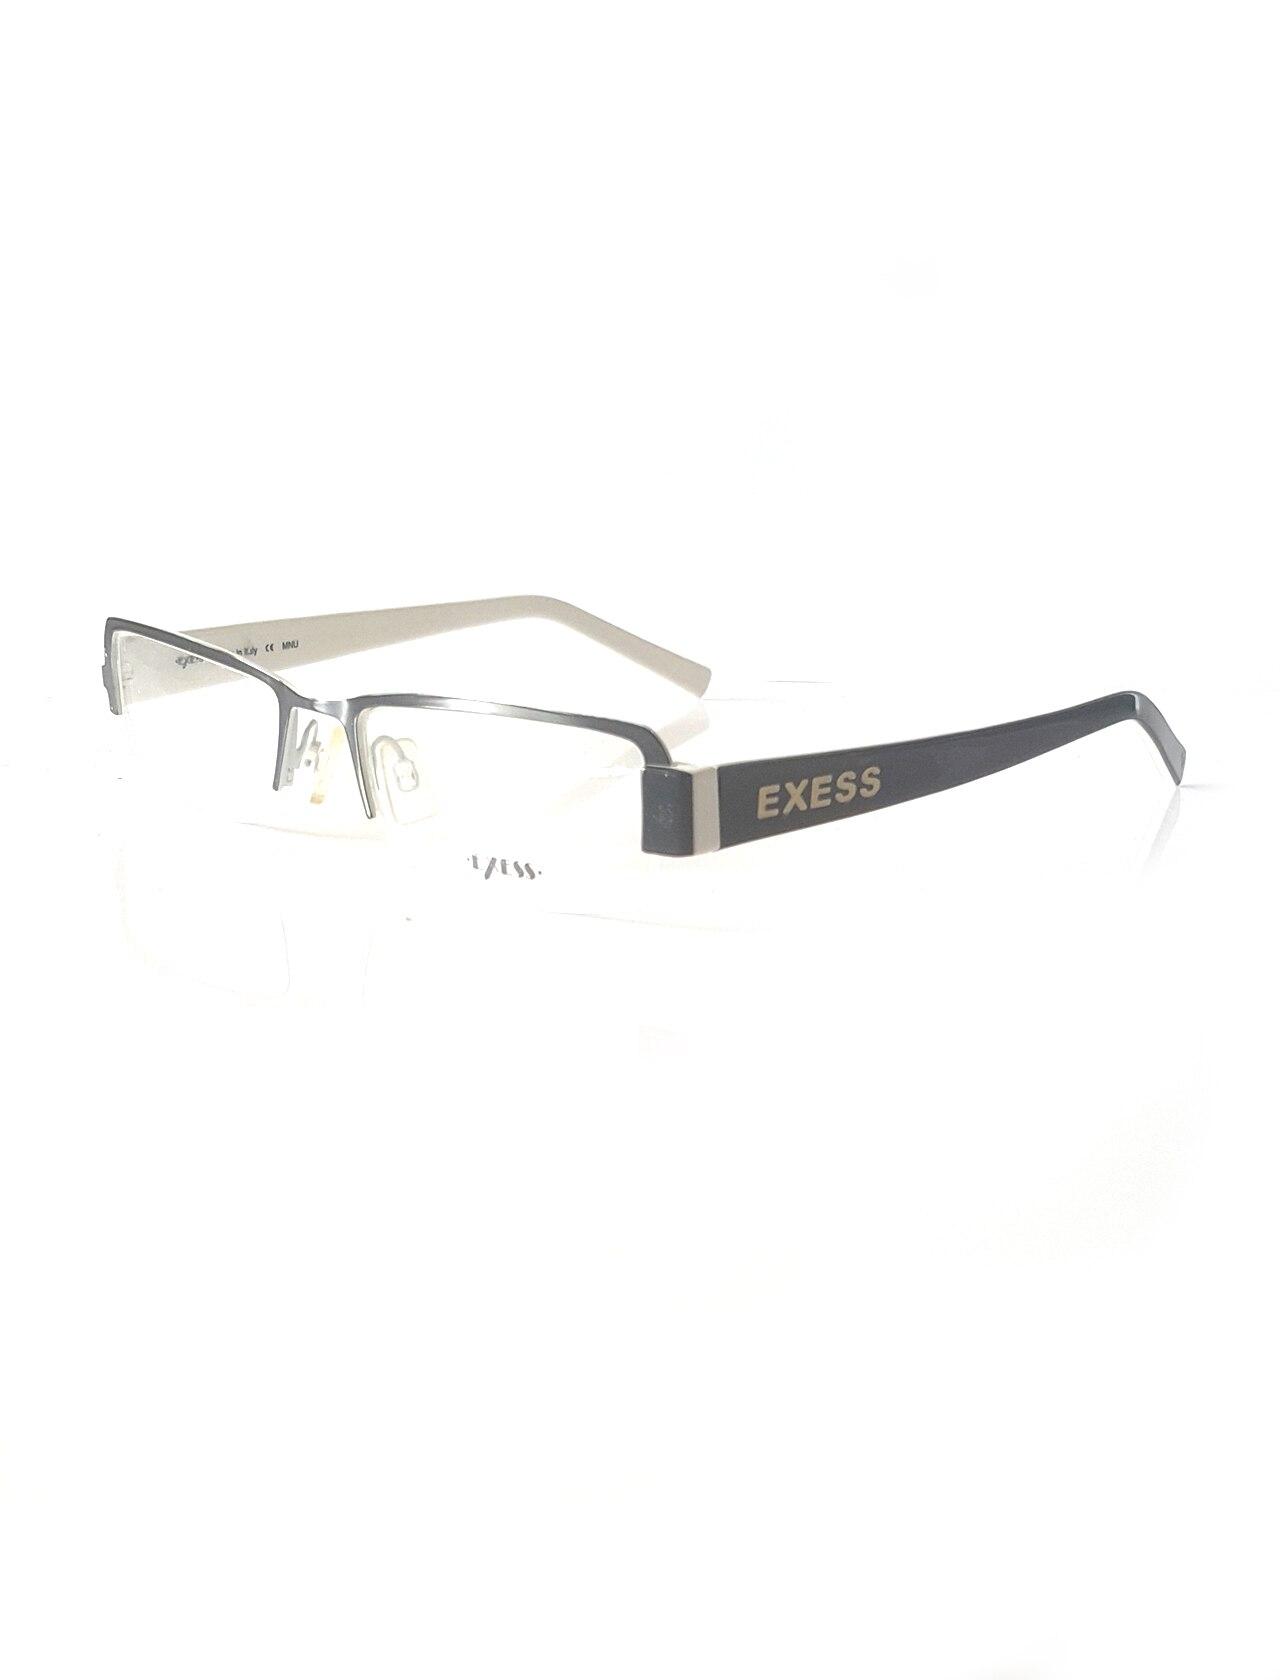 Markamilla Women Reading Glasses Frame Demo Glasses Eyewear Transparent High Quality WomenExess E 2984 5244 51